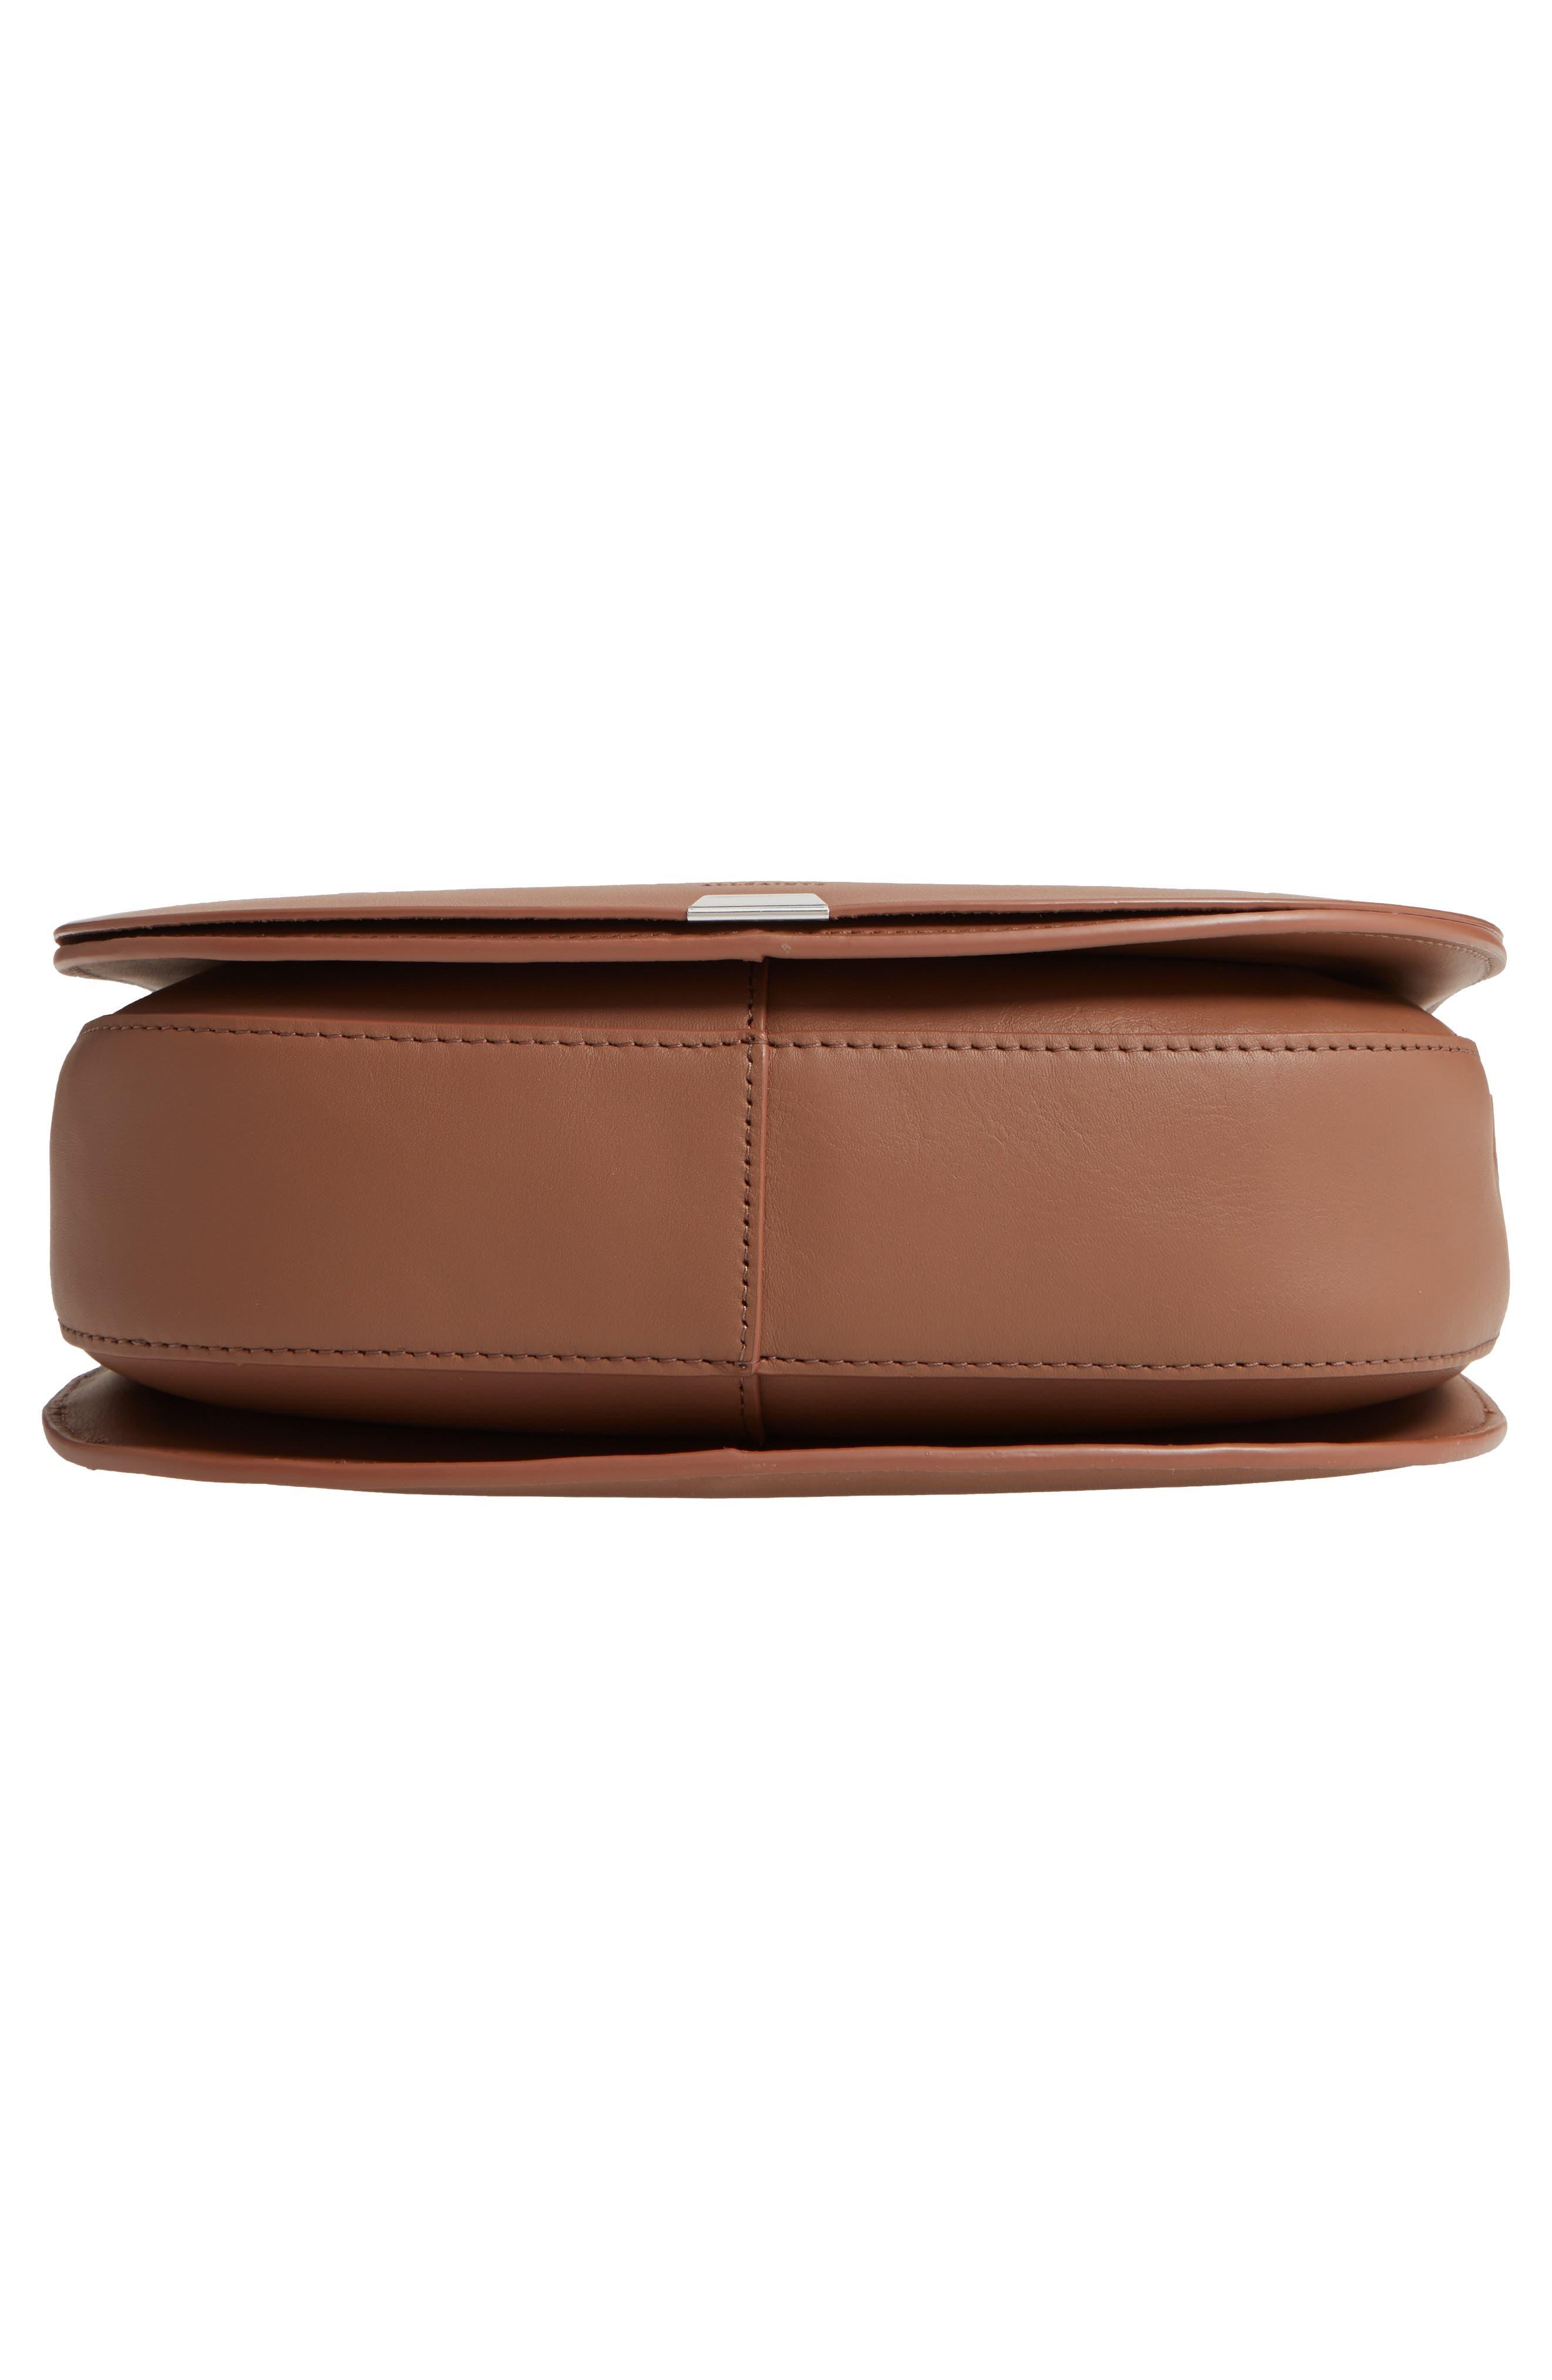 ALLSAINTS, Captain Round Leather Crossbody Bag, Alternate thumbnail 6, color, MILK CHOCOLATE